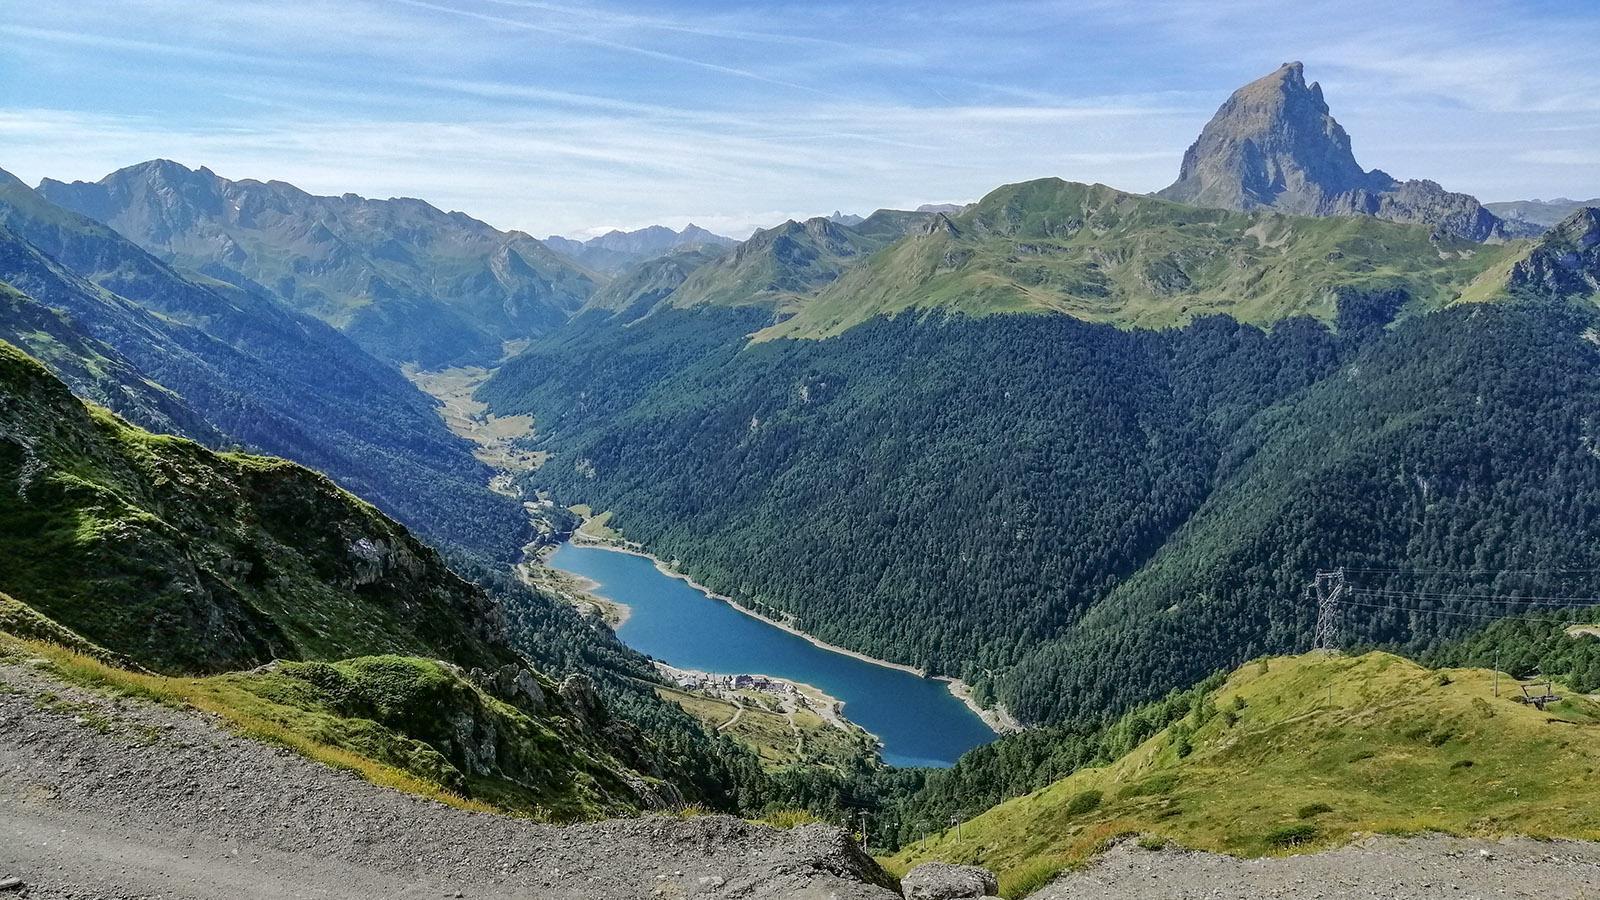 Bergsee in der Auvergne. Foto: Renée Pausch